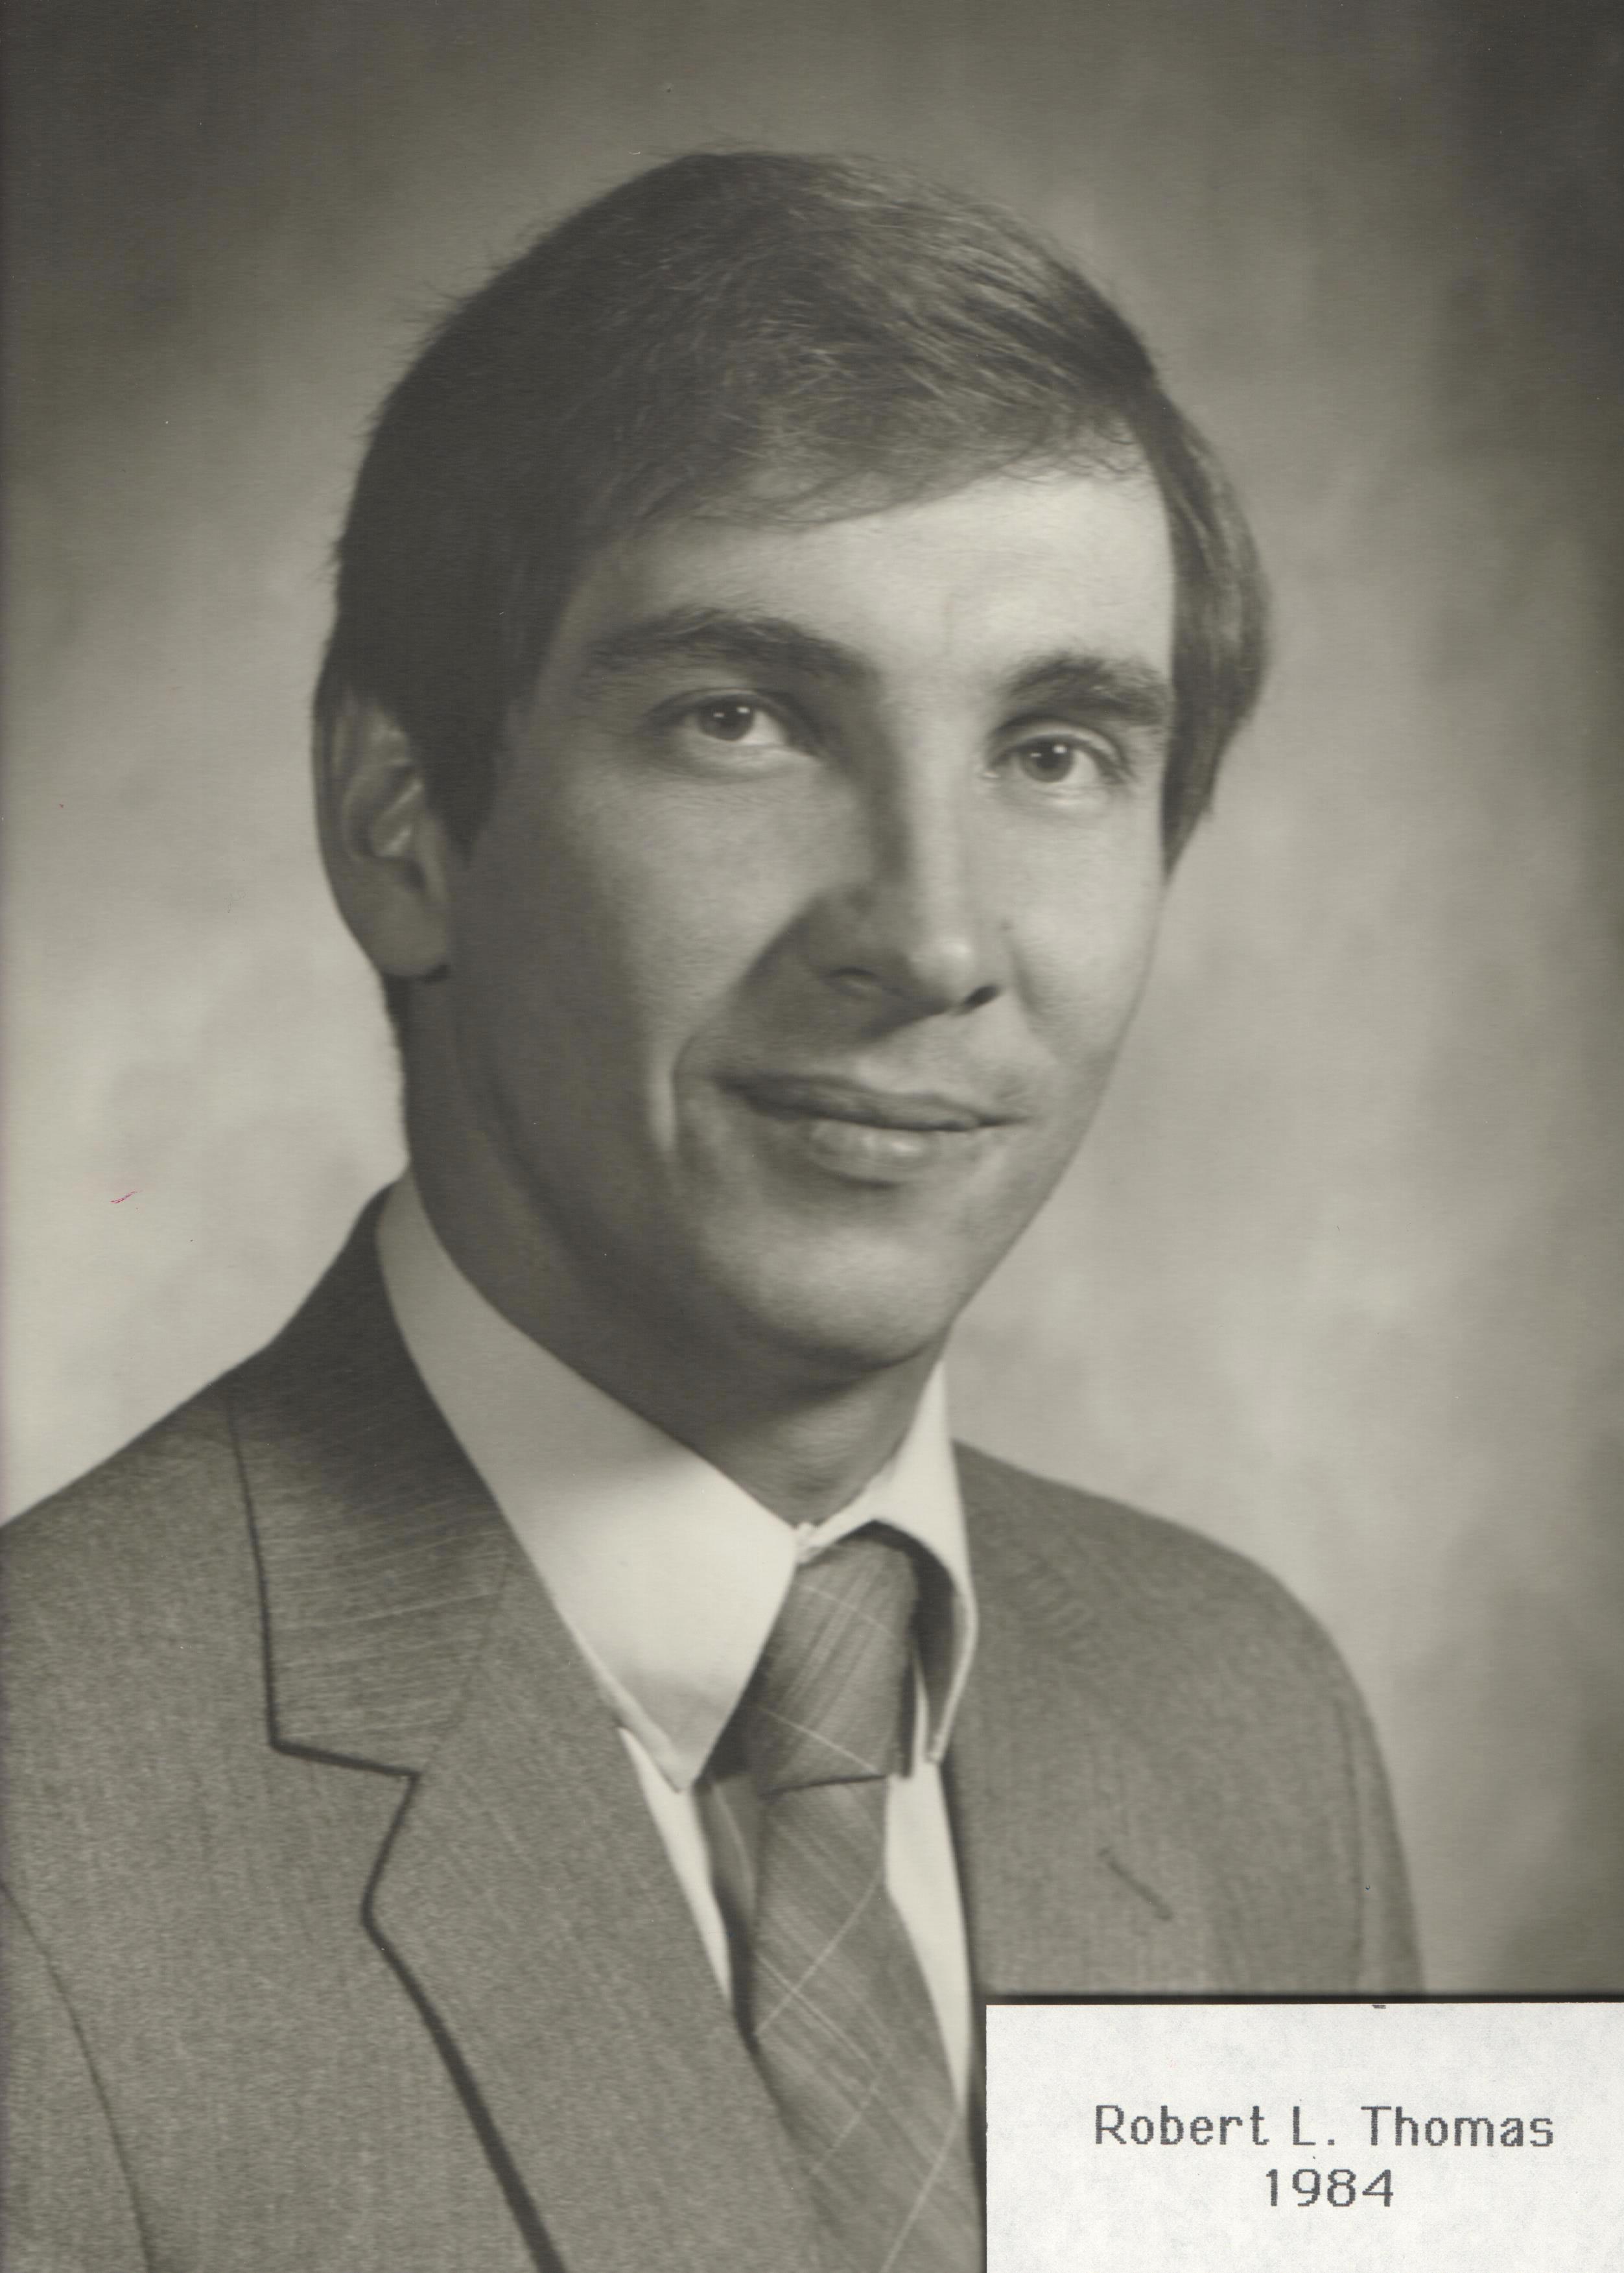 1984 Robert L. Thomas